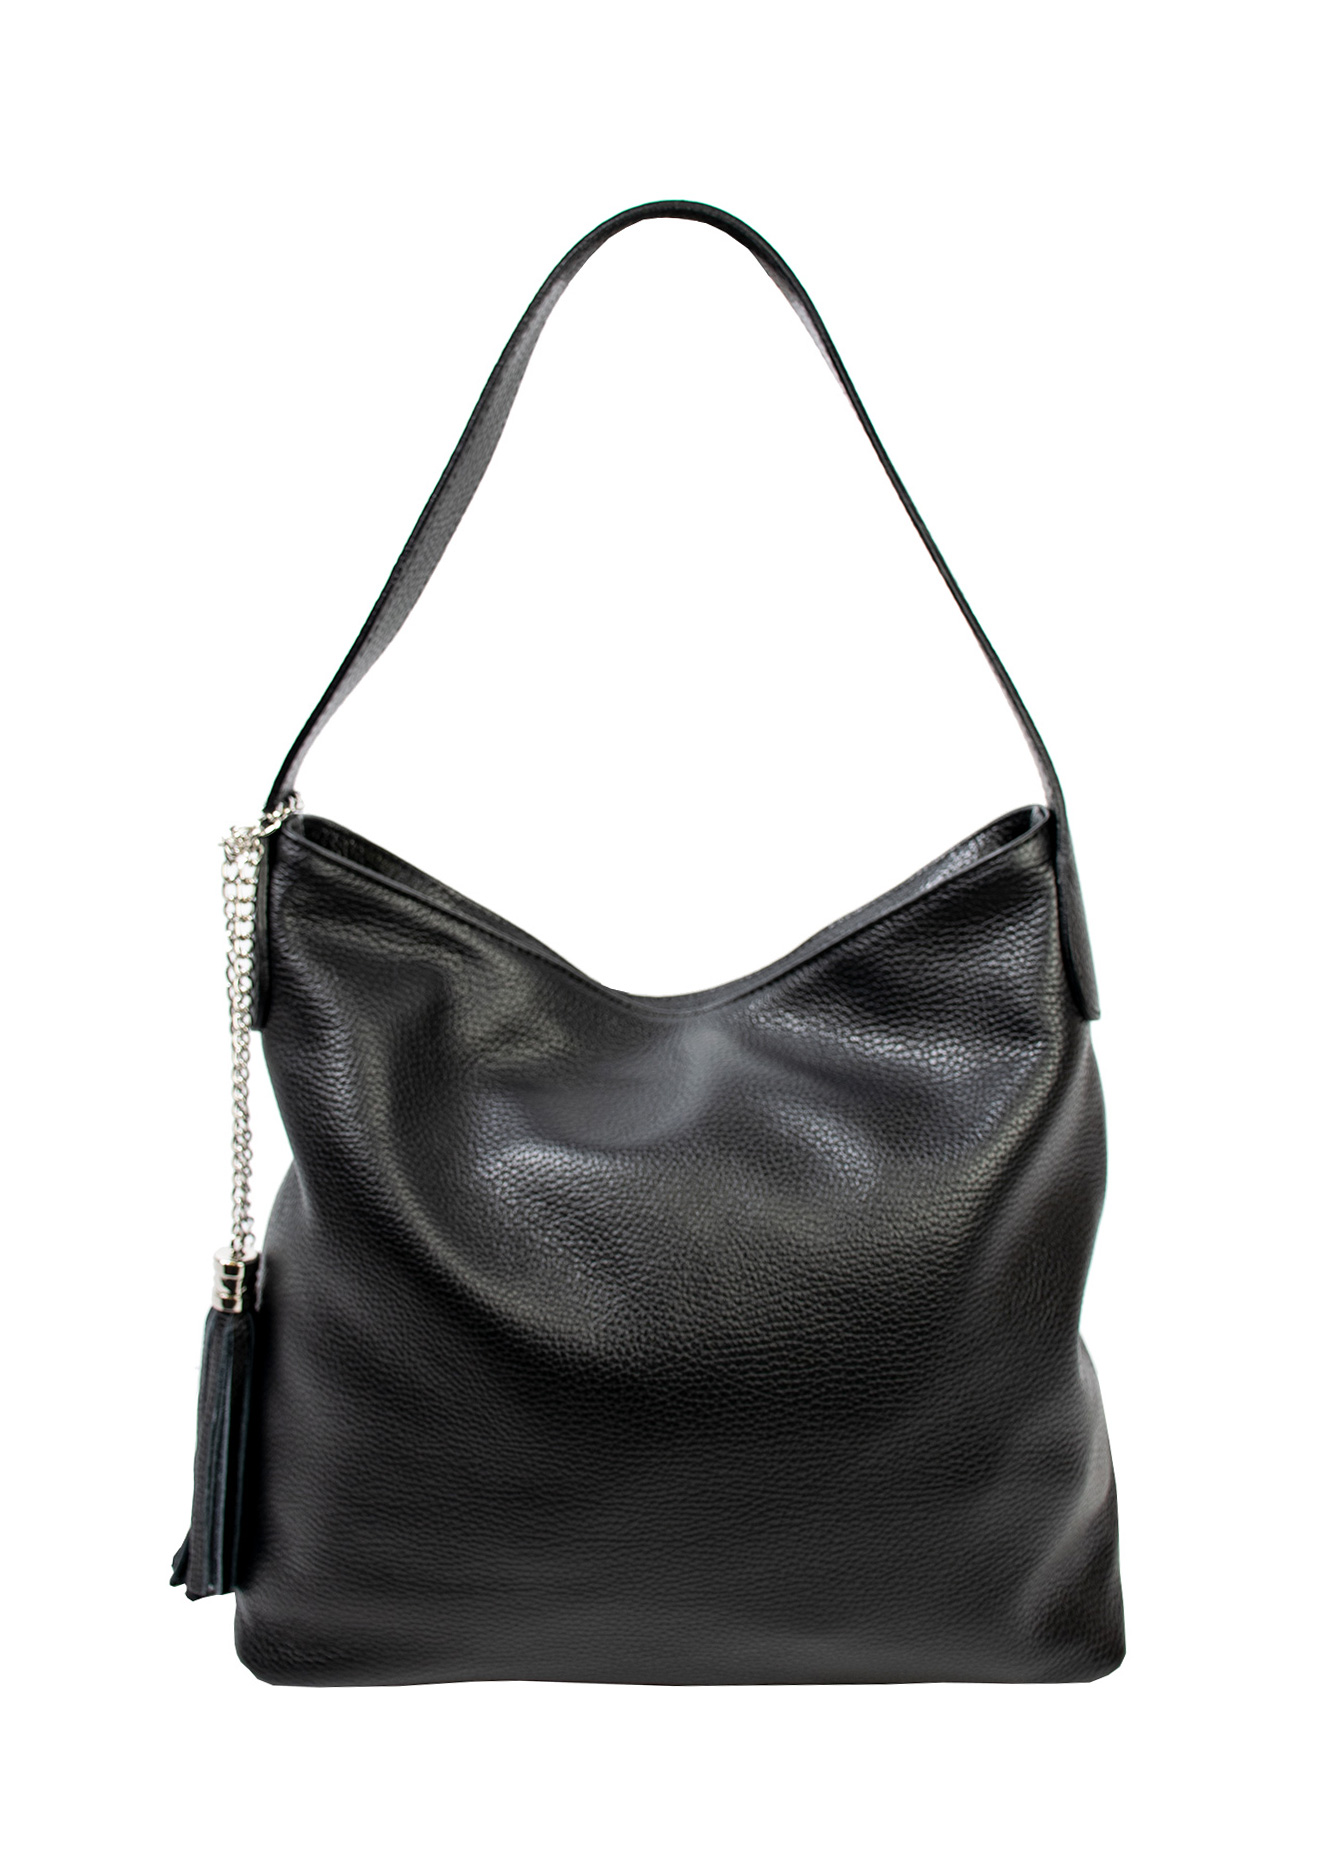 Bags and more Morella Fekete Női Bőr Válltáska